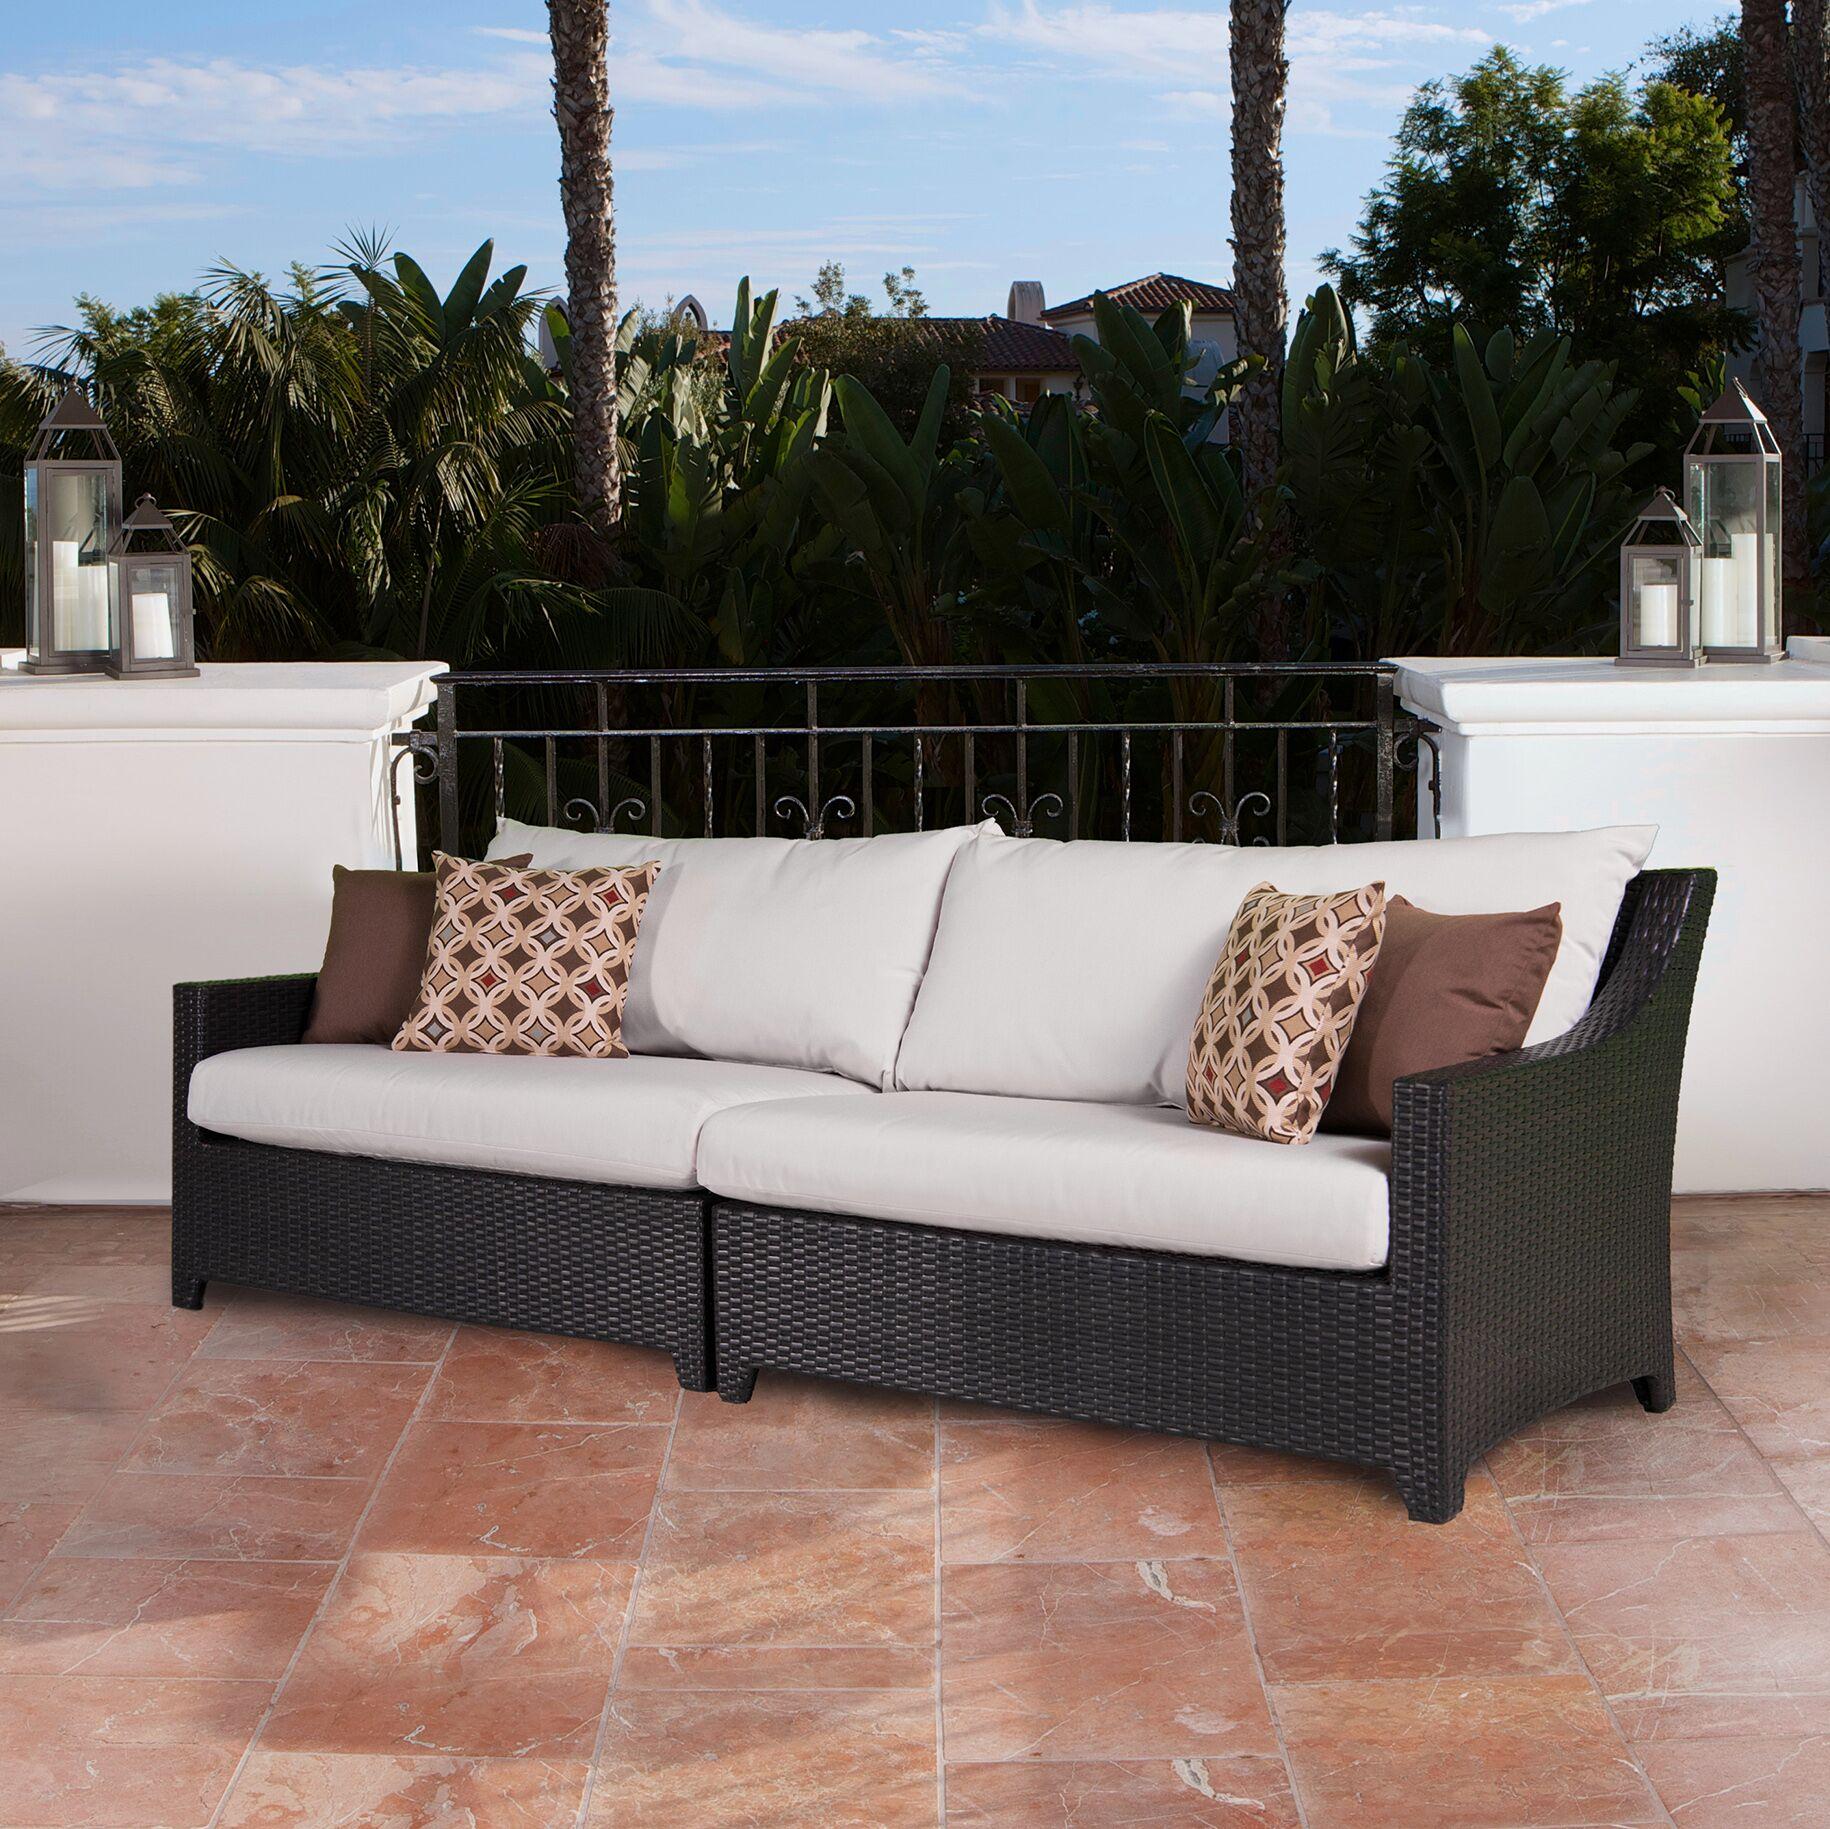 Northridge Patio Sofa with Cushions Color: Moroccan Cream